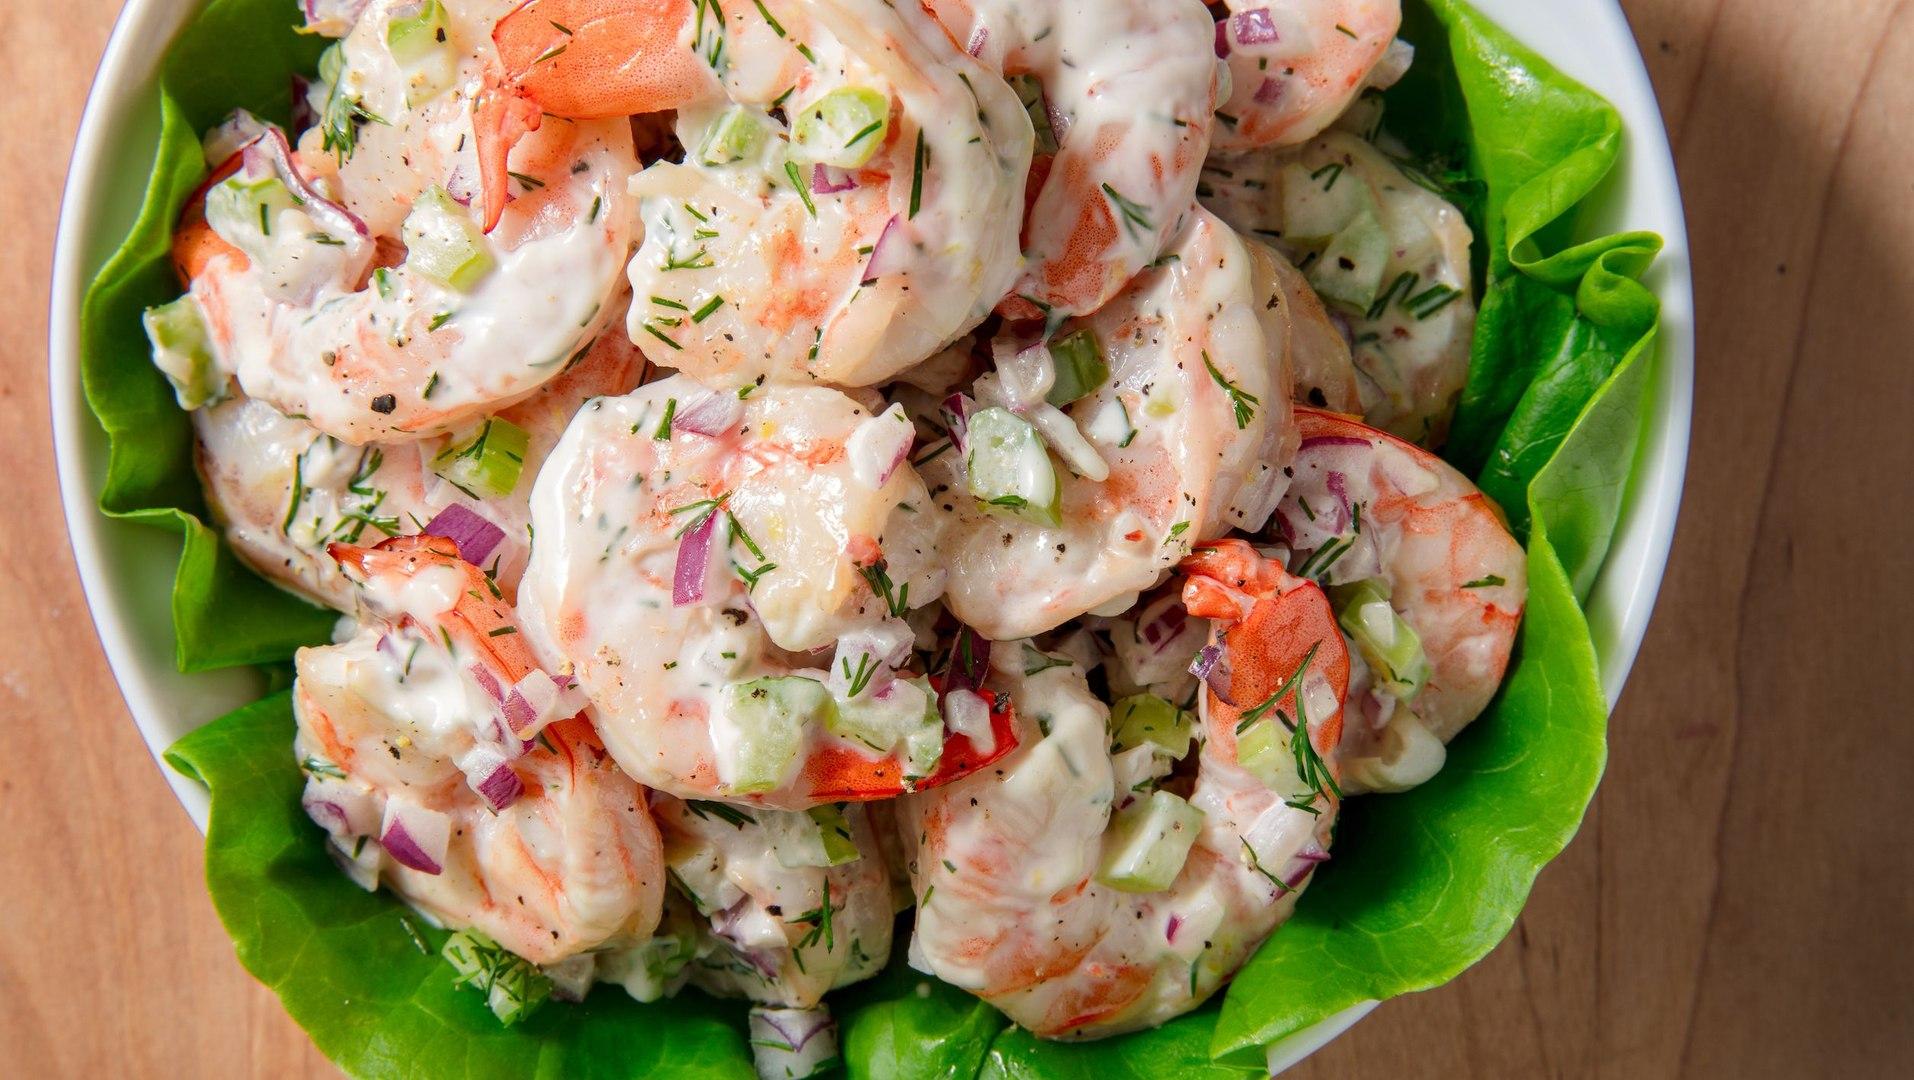 These Shrimp Salad Lettuce Wraps Are Light & Delicious